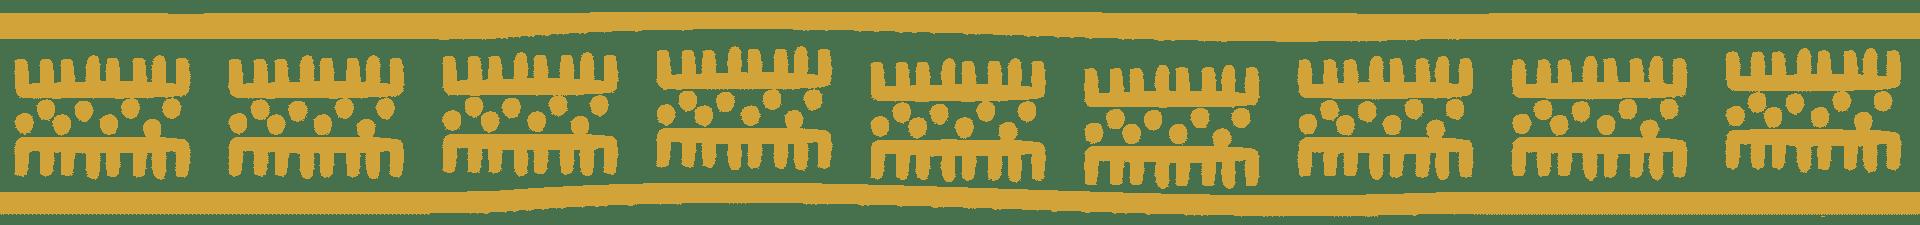 AOSSY-pattern-african-jaune